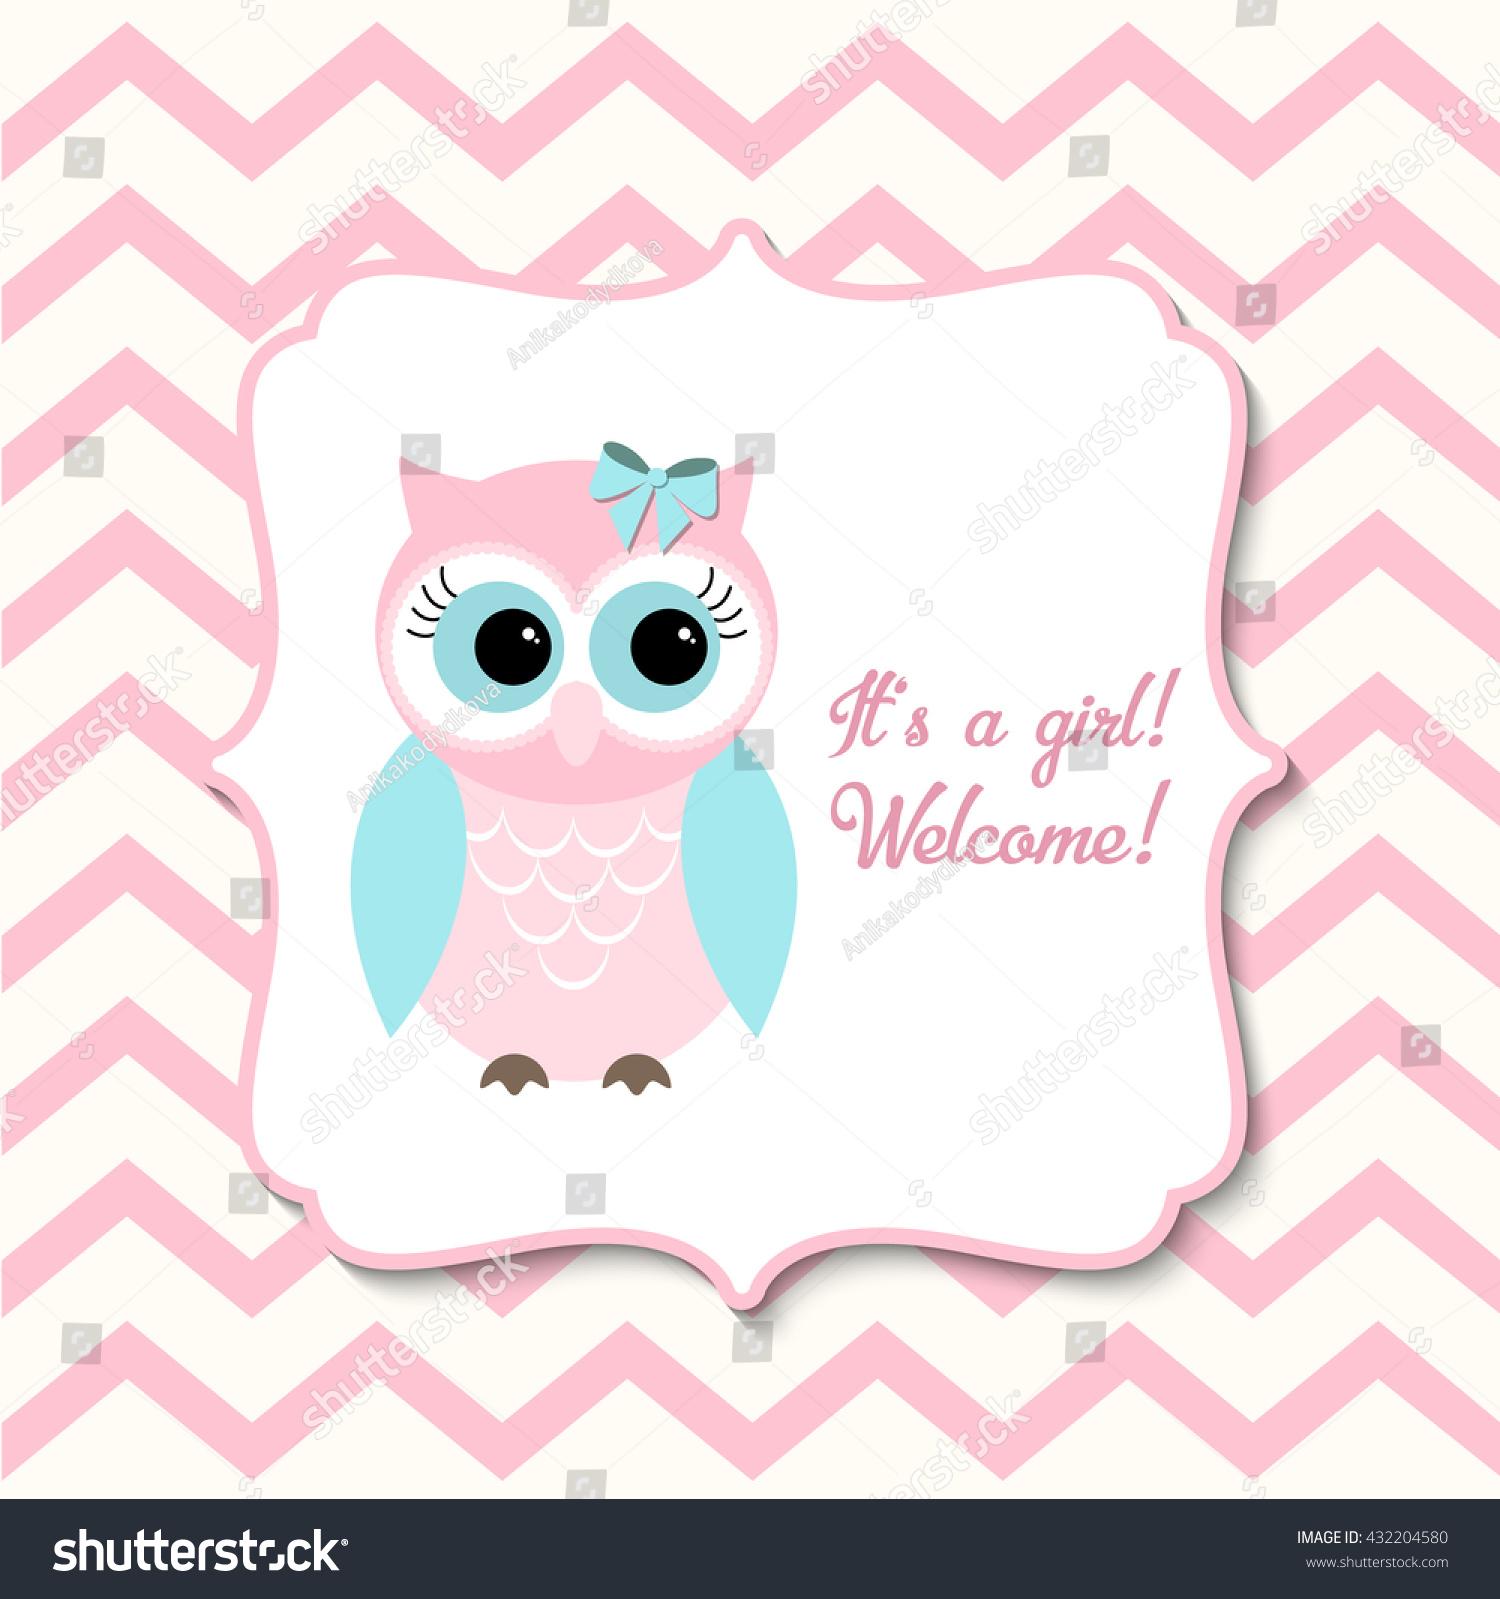 Baby Shower Girls Cute Pink Owl Stock Vector Shutterstock